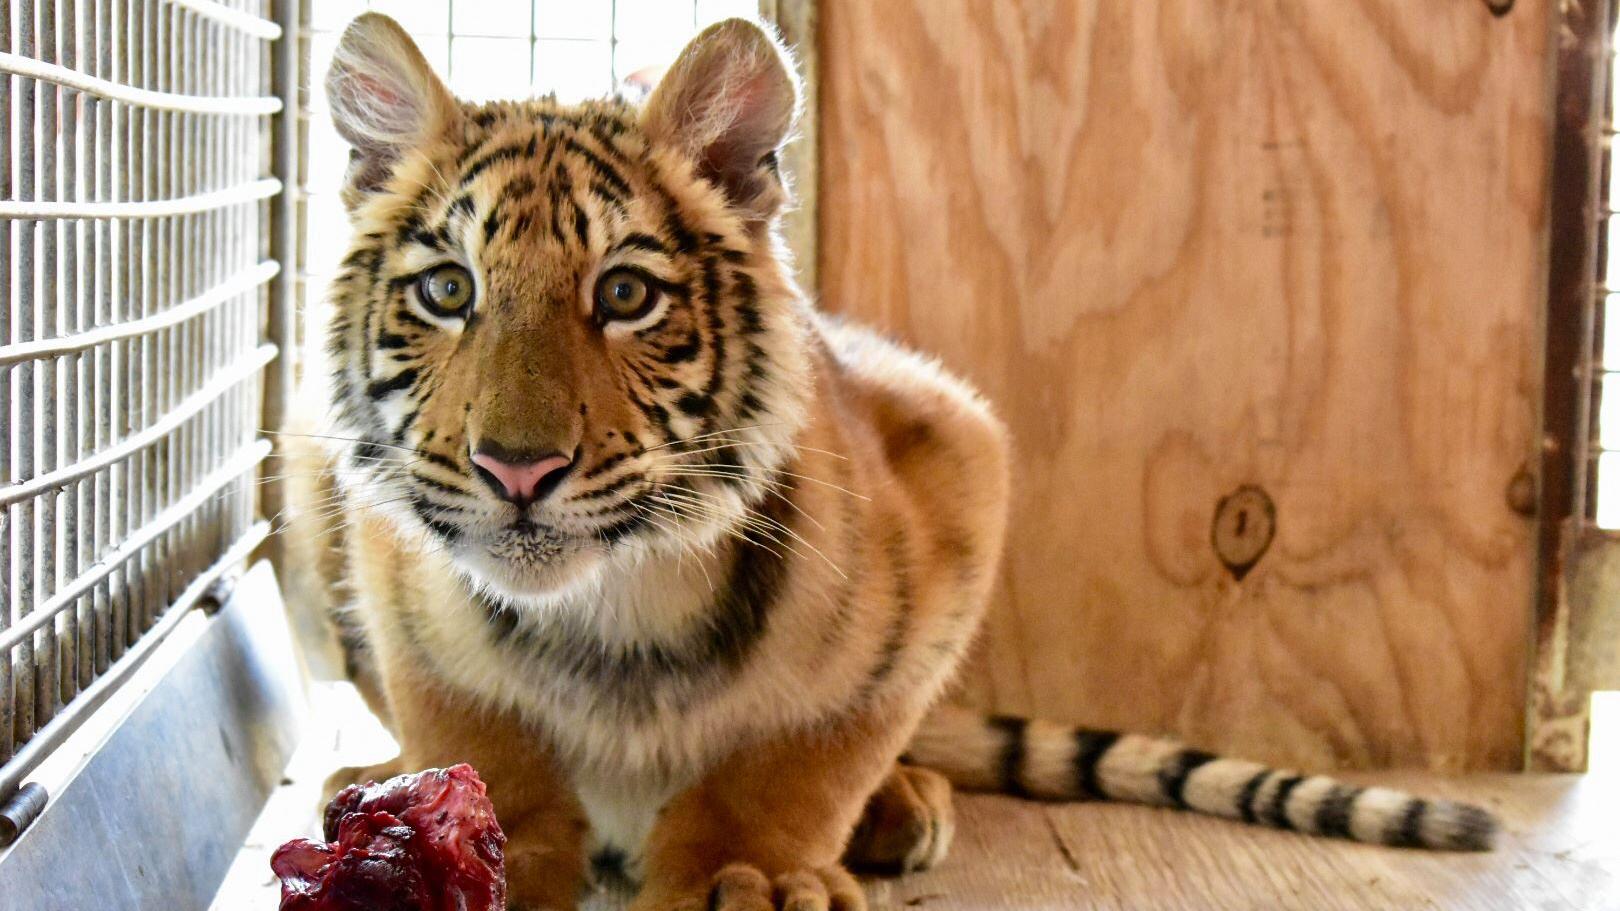 kenobi tiger 2_1532704649662.jpg.jpg